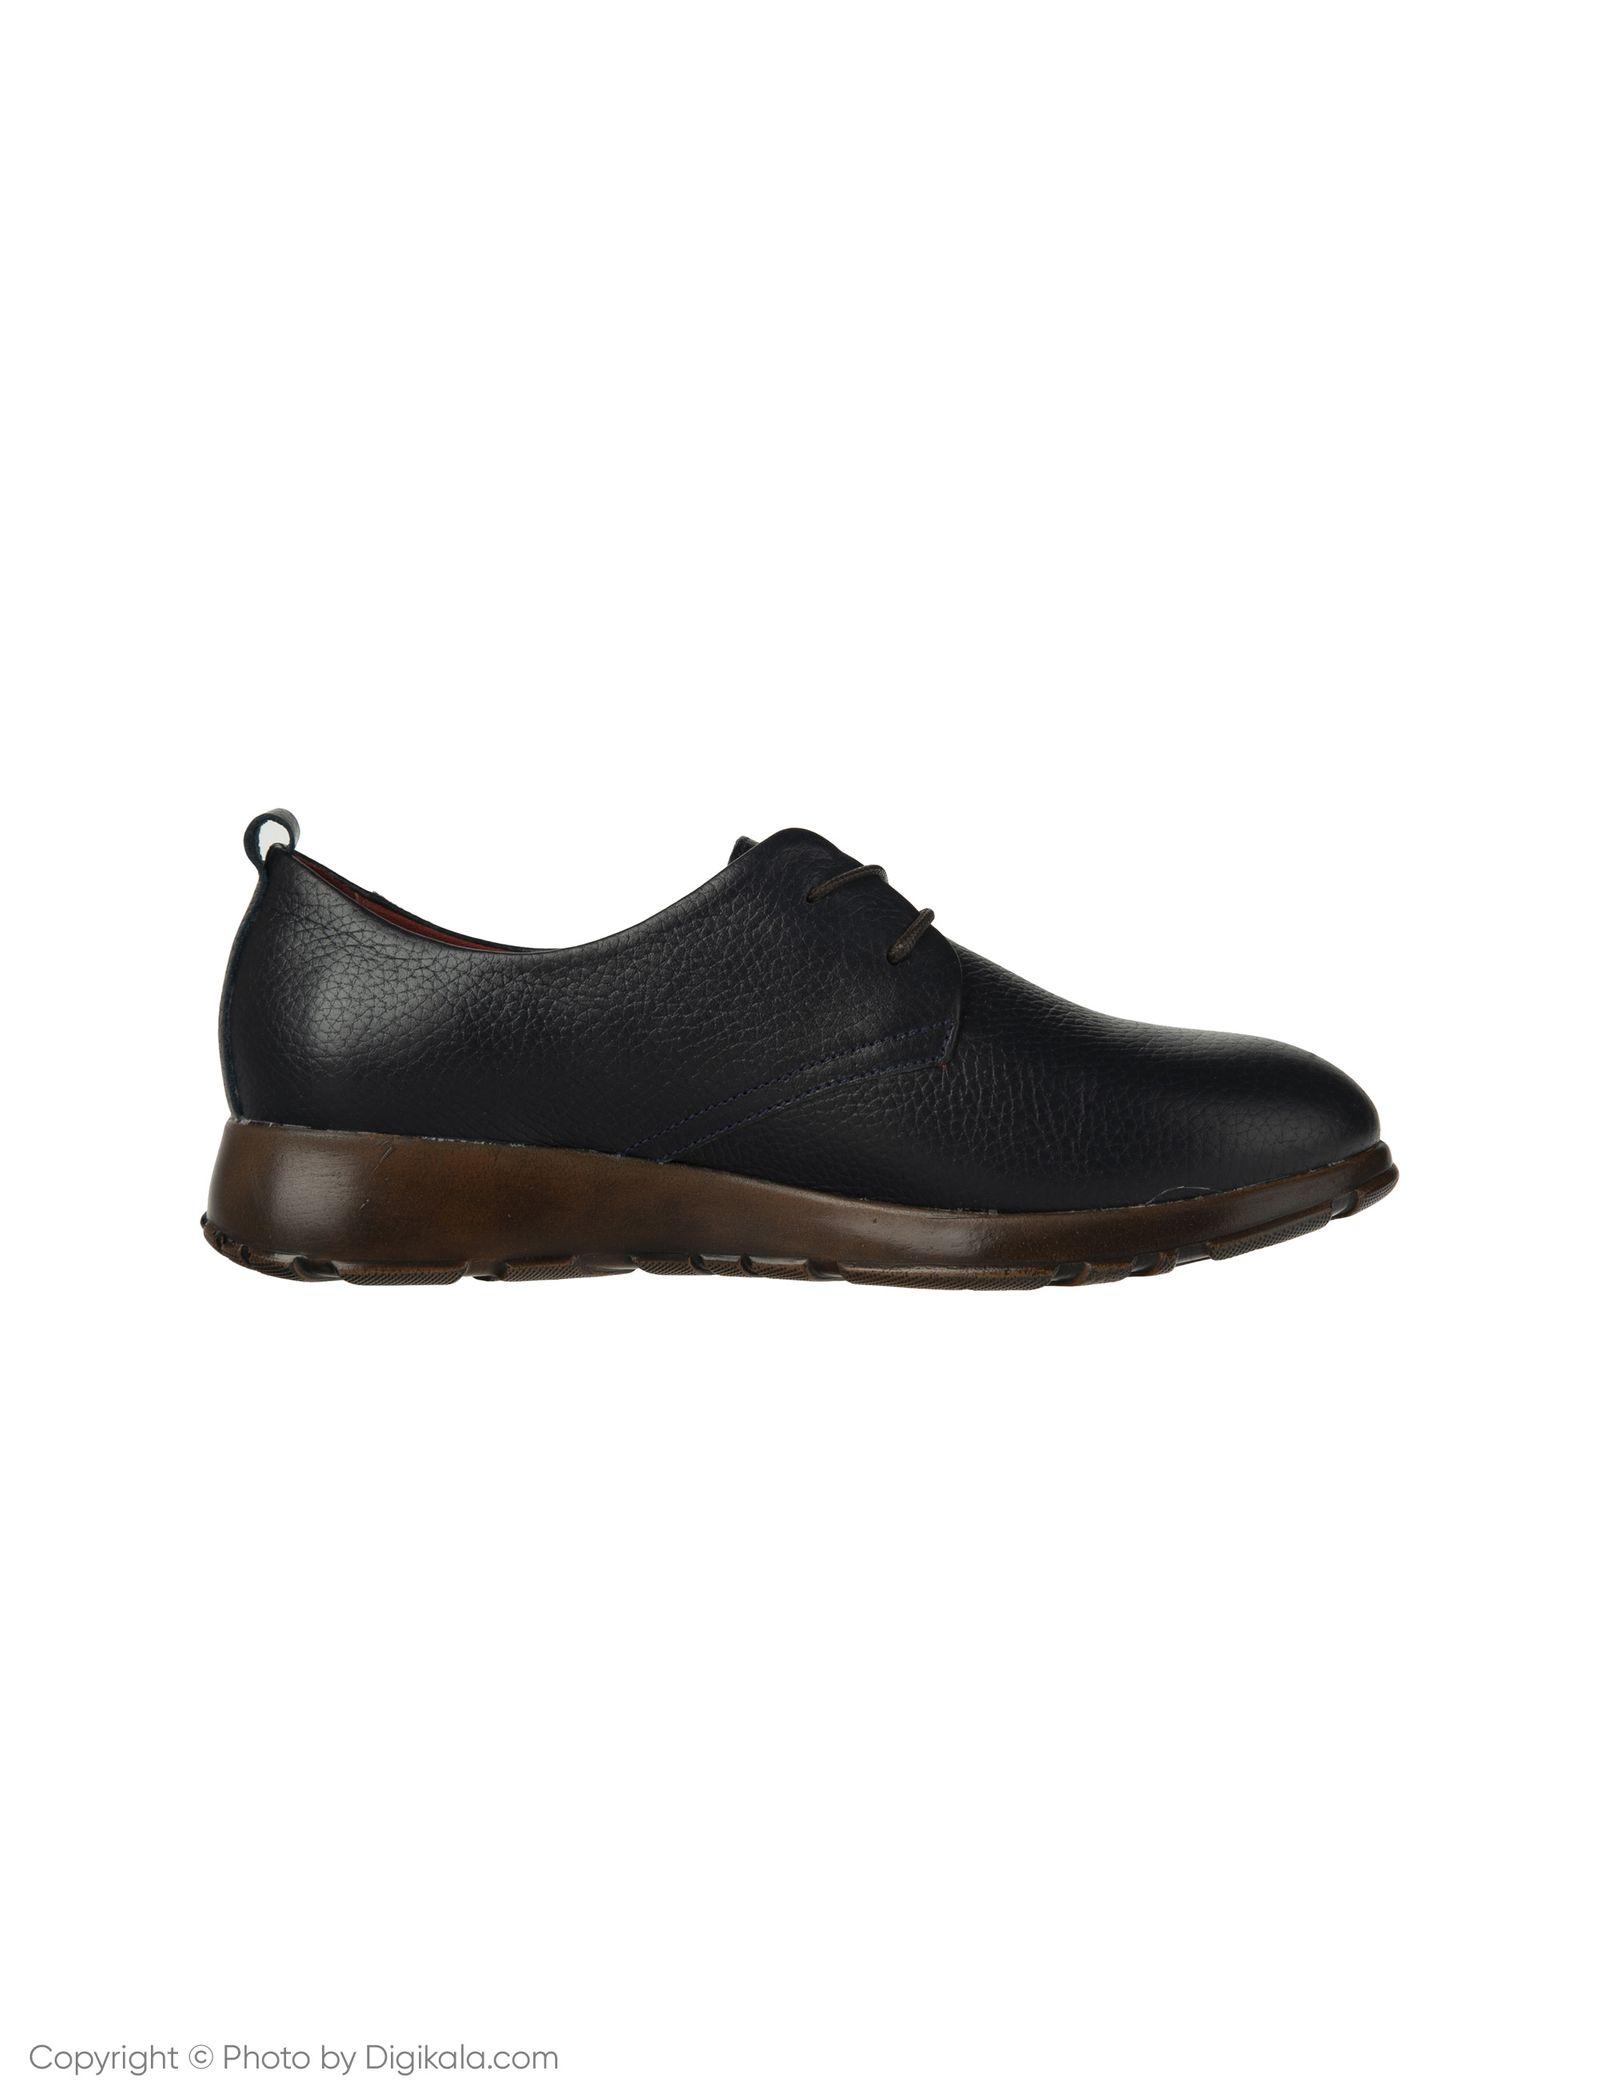 کفش روزمره زنانه ساتین مدل SN5184A-103 -  - 2